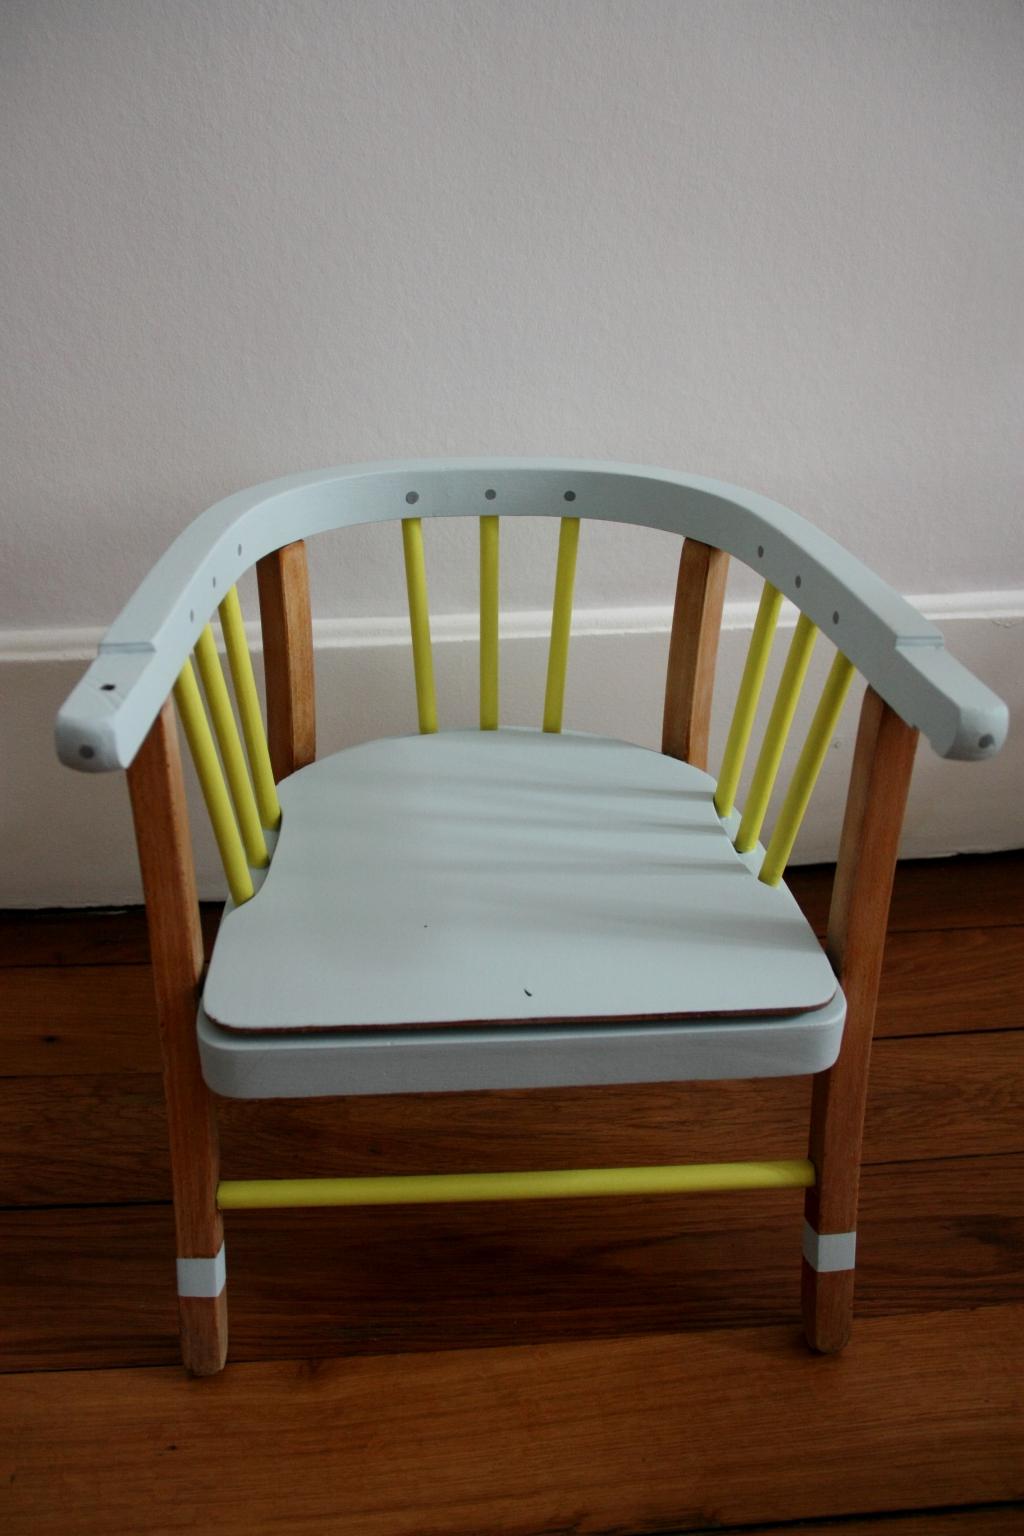 chaise pot baumann vendue goodbye yesterday hello tomorrow lifestyleblog. Black Bedroom Furniture Sets. Home Design Ideas